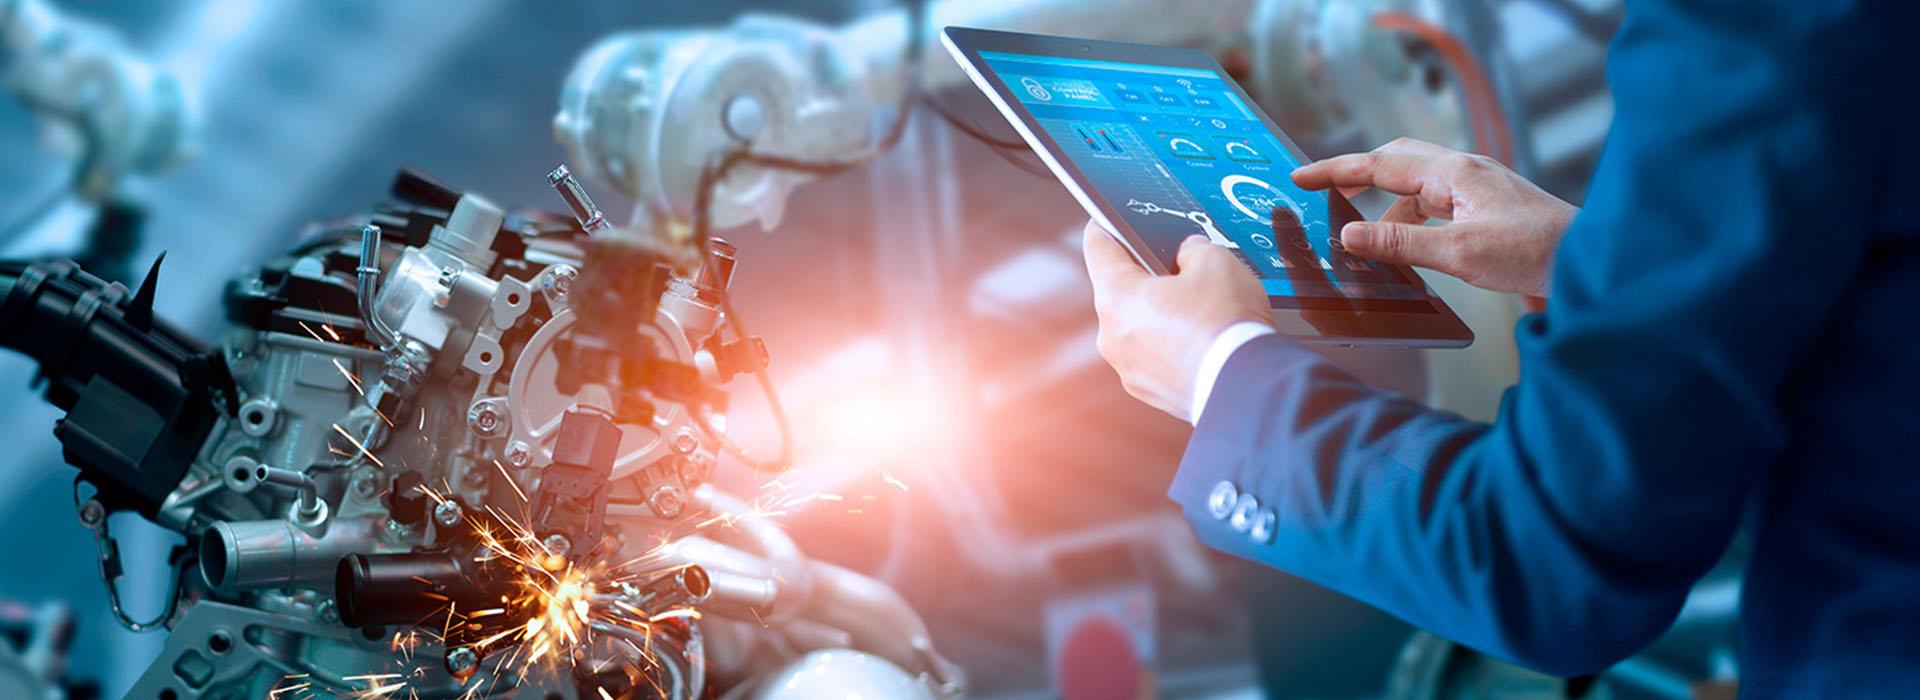 Automatiyacija u Industriji